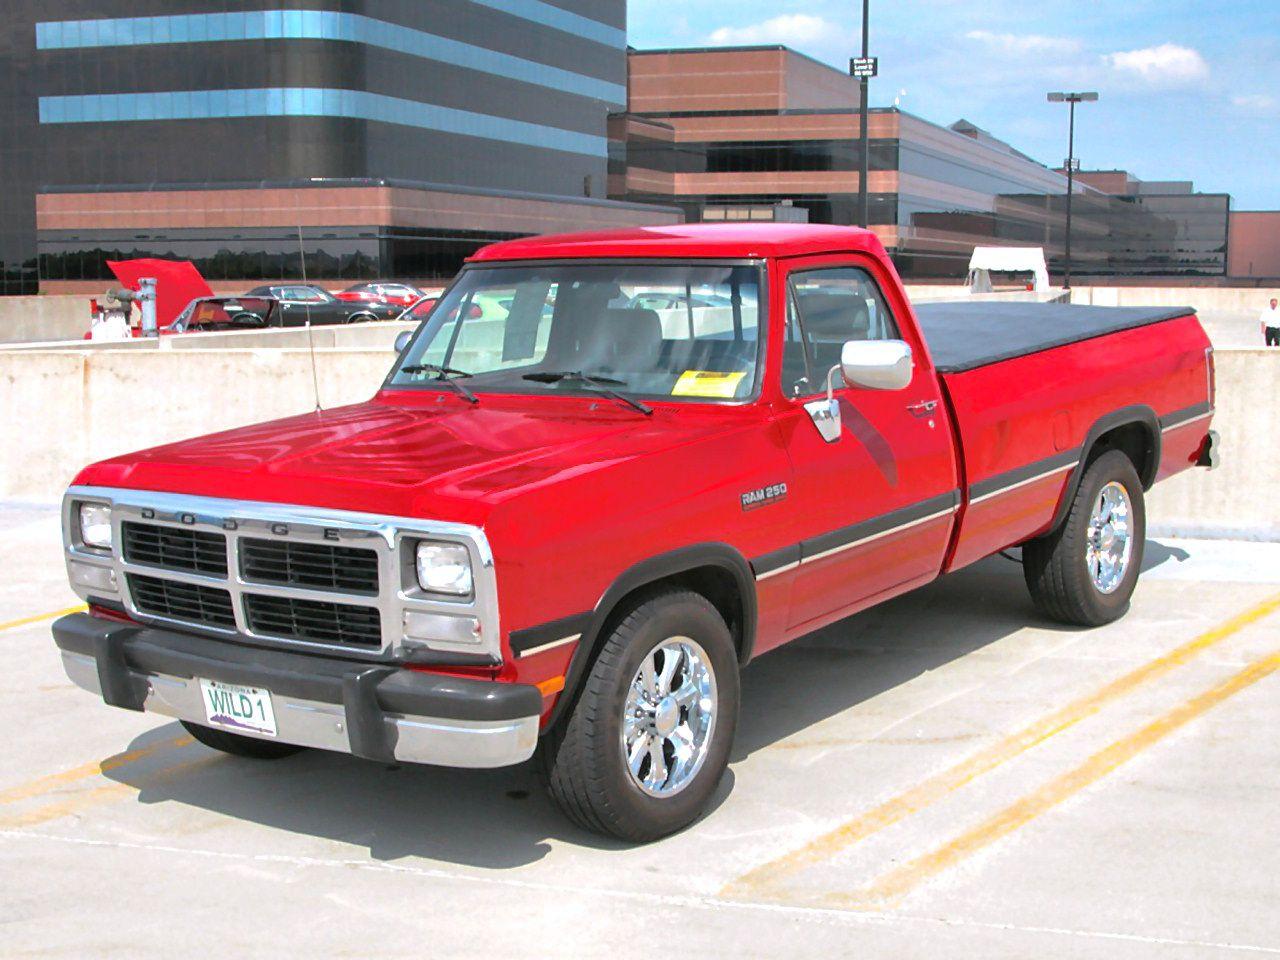 1992 Dodge Ram 250 Cummins Dodge Pickup Dodge Trucks Dodge